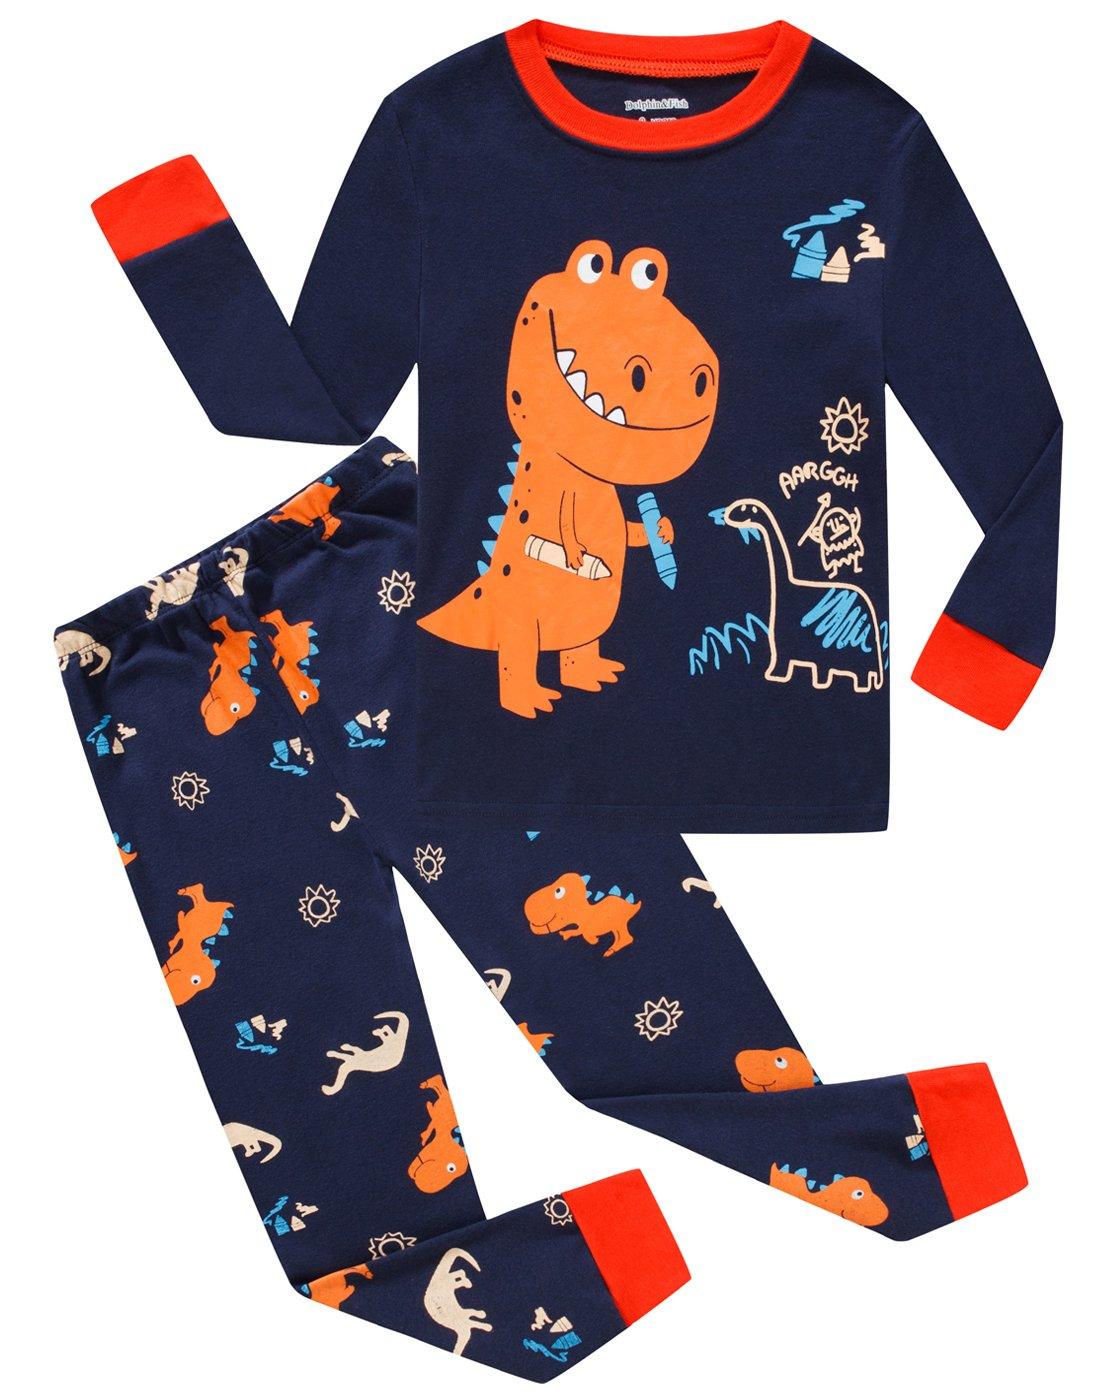 Cotton Little Boys Pajamas